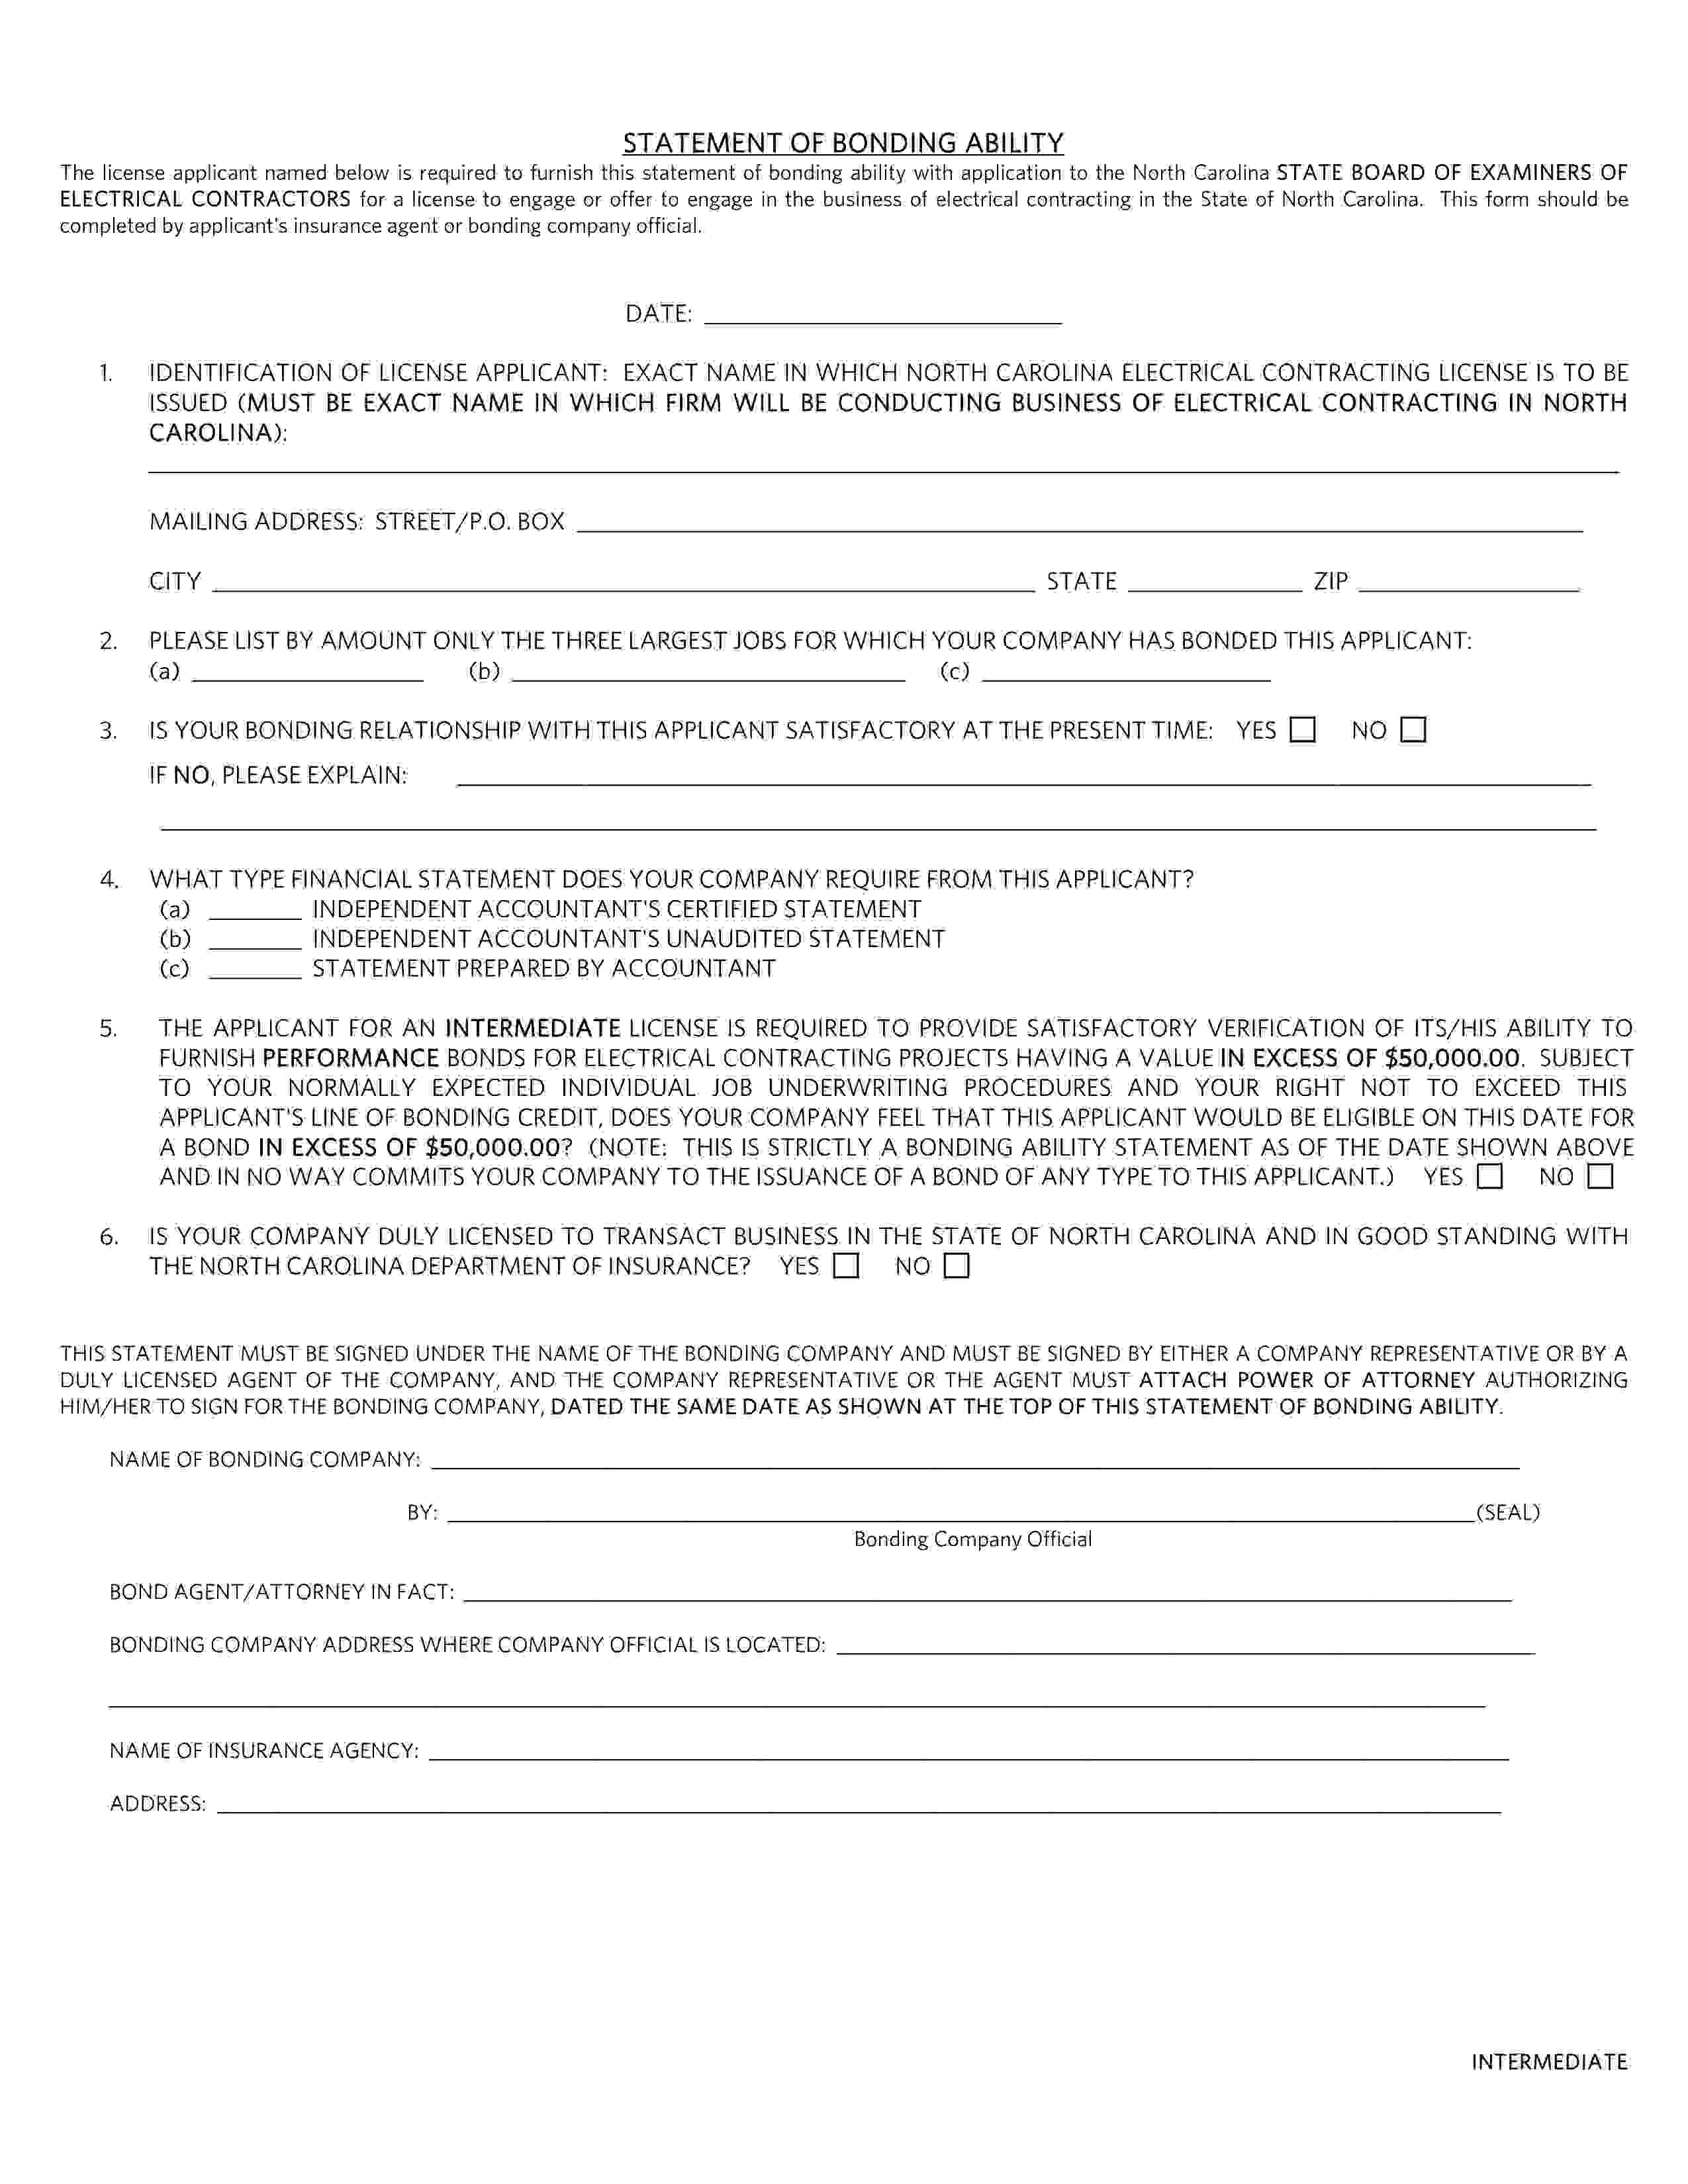 State of North Carolina Statement of Bonding Ability:  Intermediate sample image